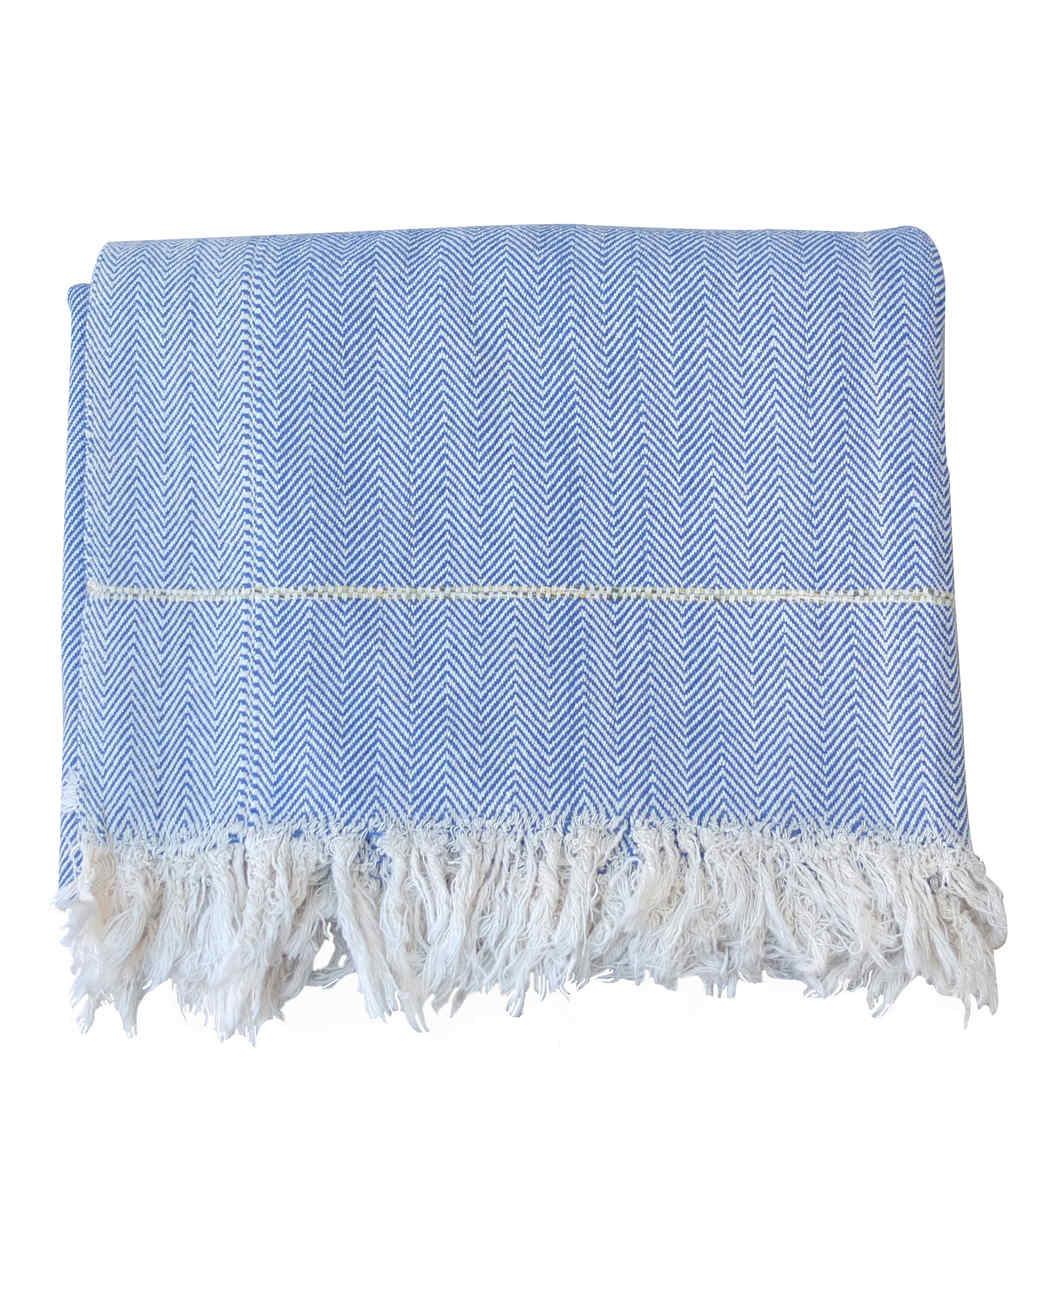 picnic blanket folded